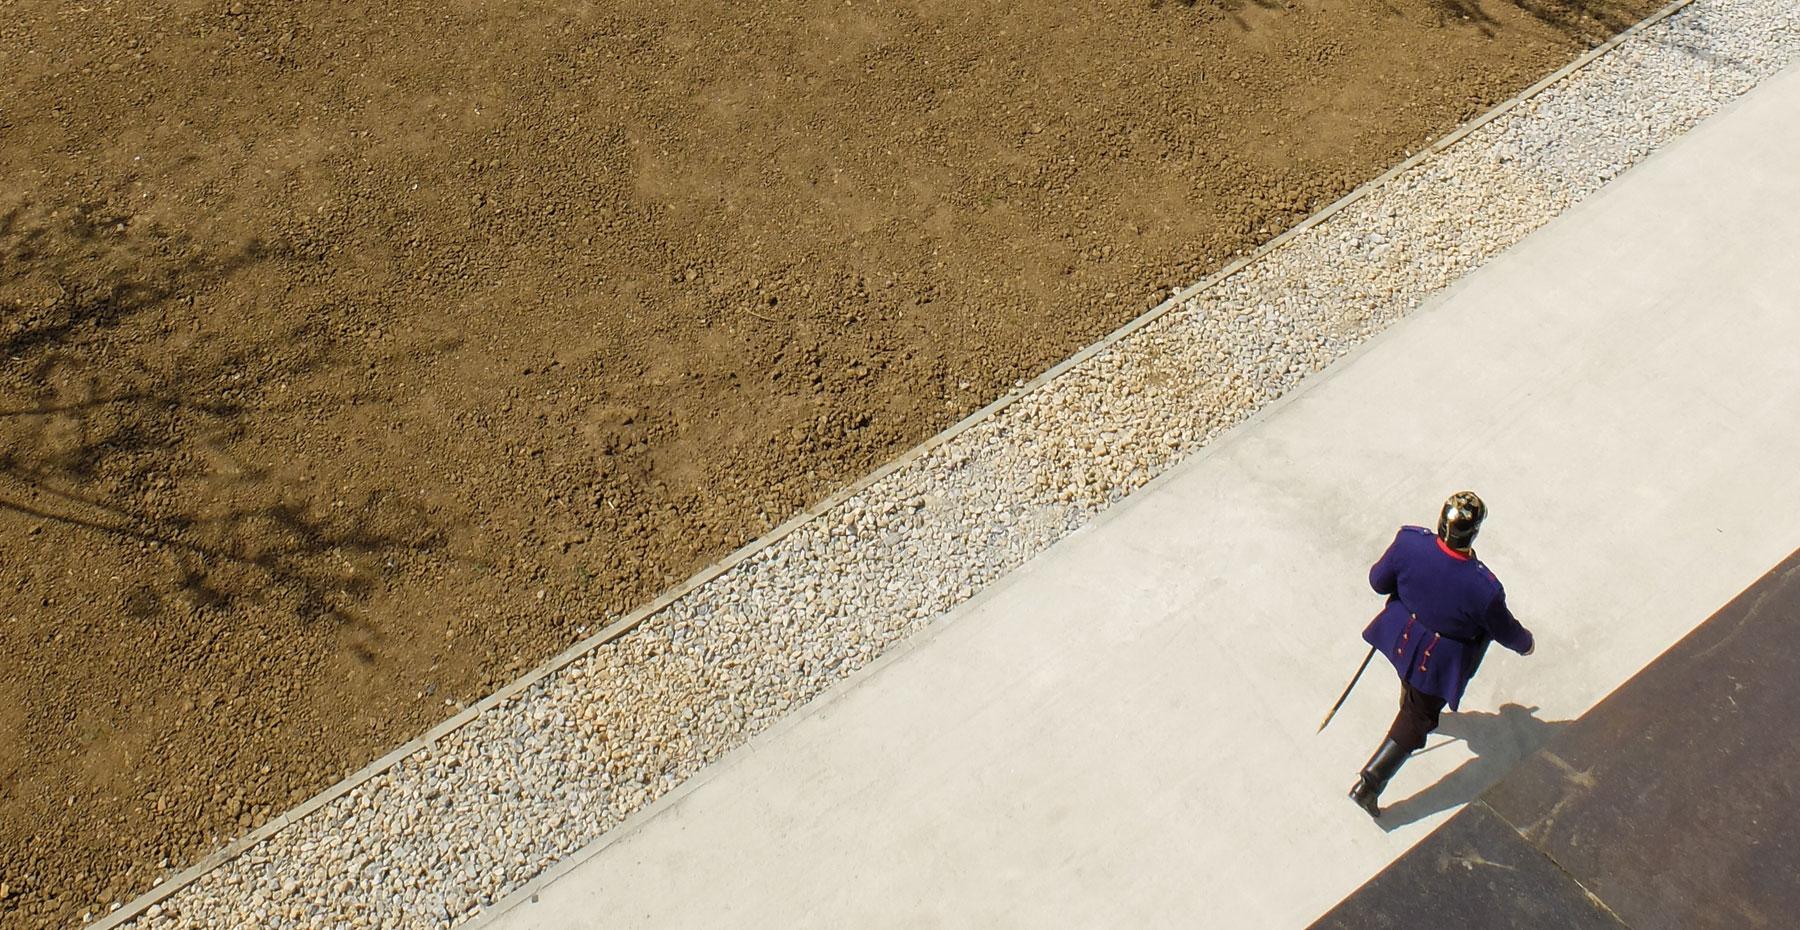 De pierre et d'herbe ; Gravelotte ; FORR - PAYSAGE | URBANISME ; FORR paysagiste